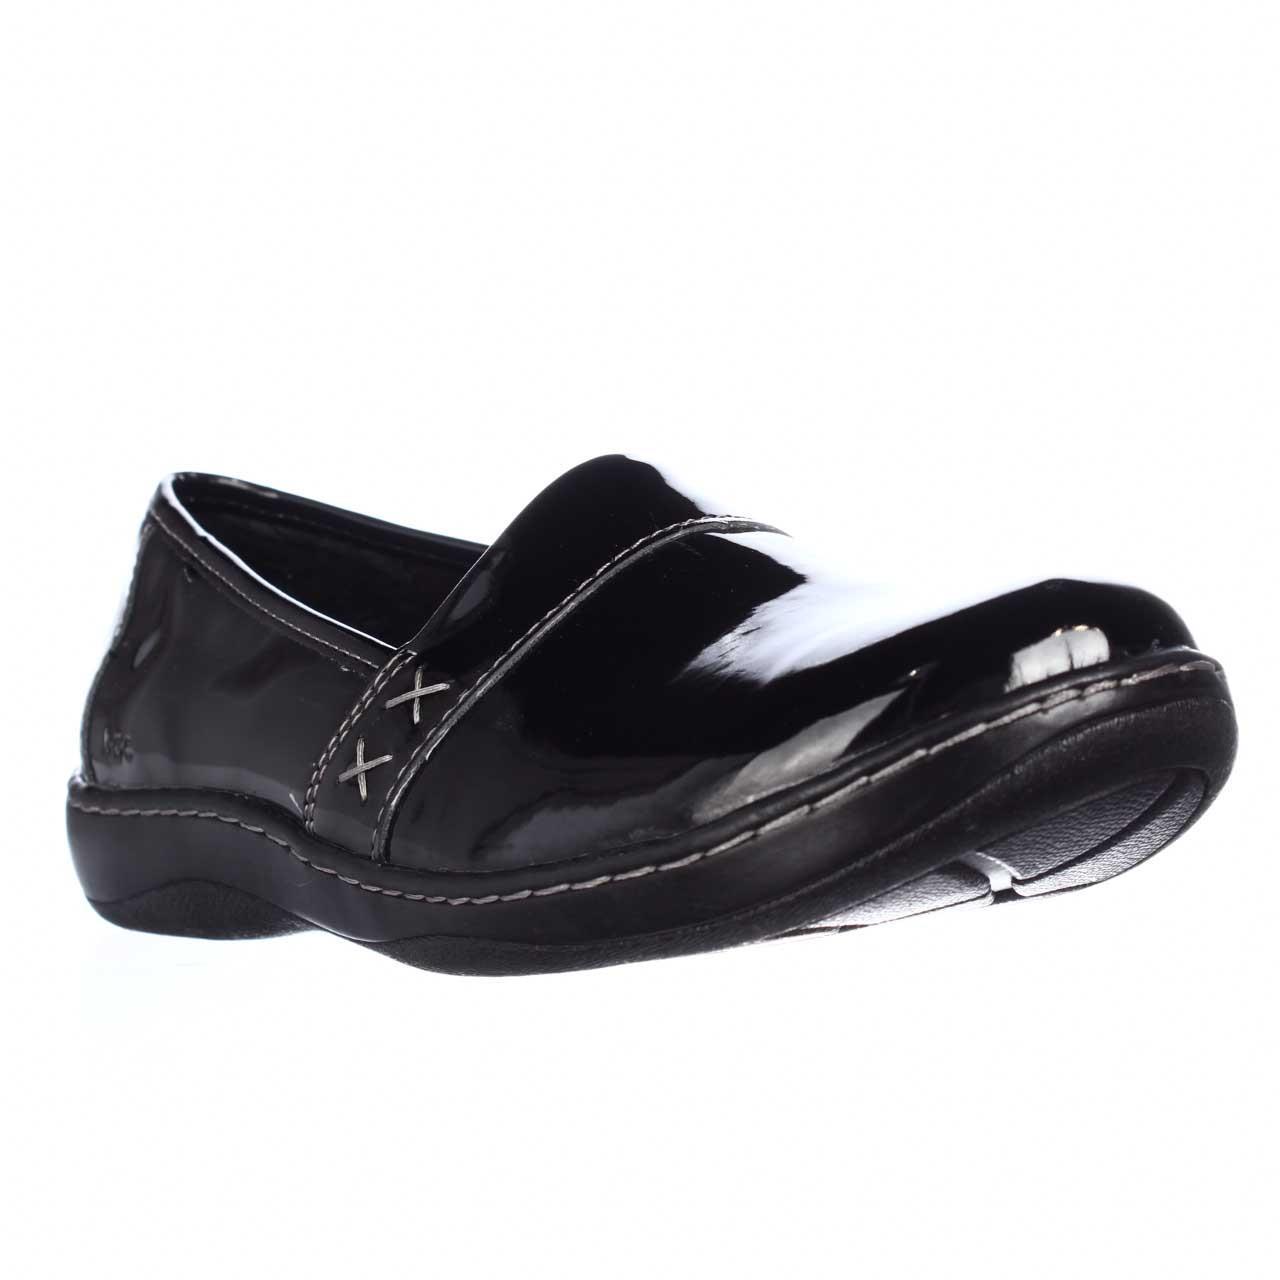 Womens B.O.C Born Howell Comfort Slip On Flats - Black